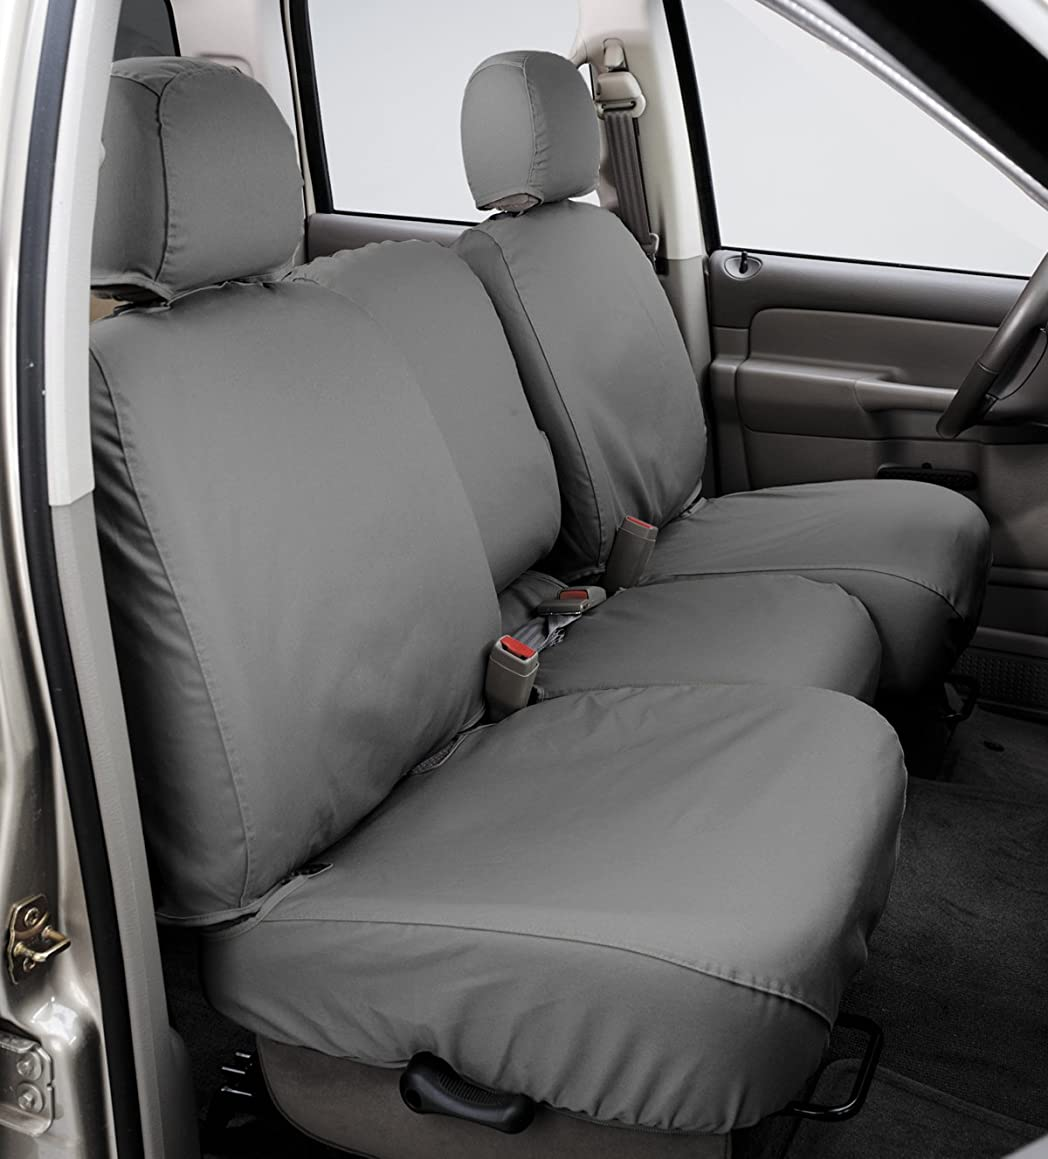 Covercraft SS8429PCGY SeatSaver Second Row Custom Fit Seat Cover for Select Chevrolet Silverado 1500/GMC Sierra 1500 Models - Polycotton (Grey)